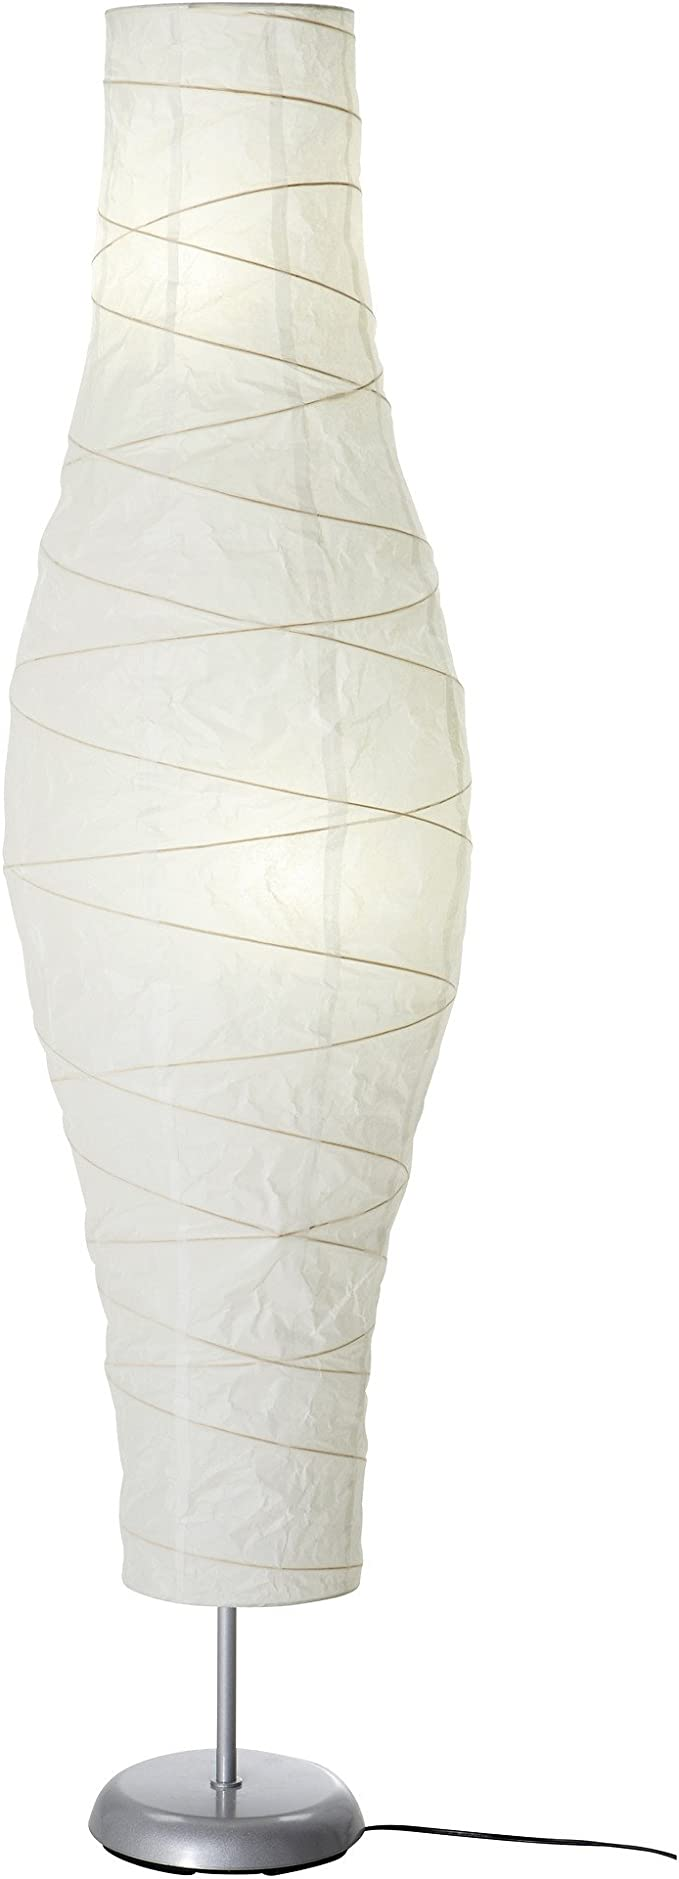 Ikea Stehlampe Dudero Amazon De Beleuchtung